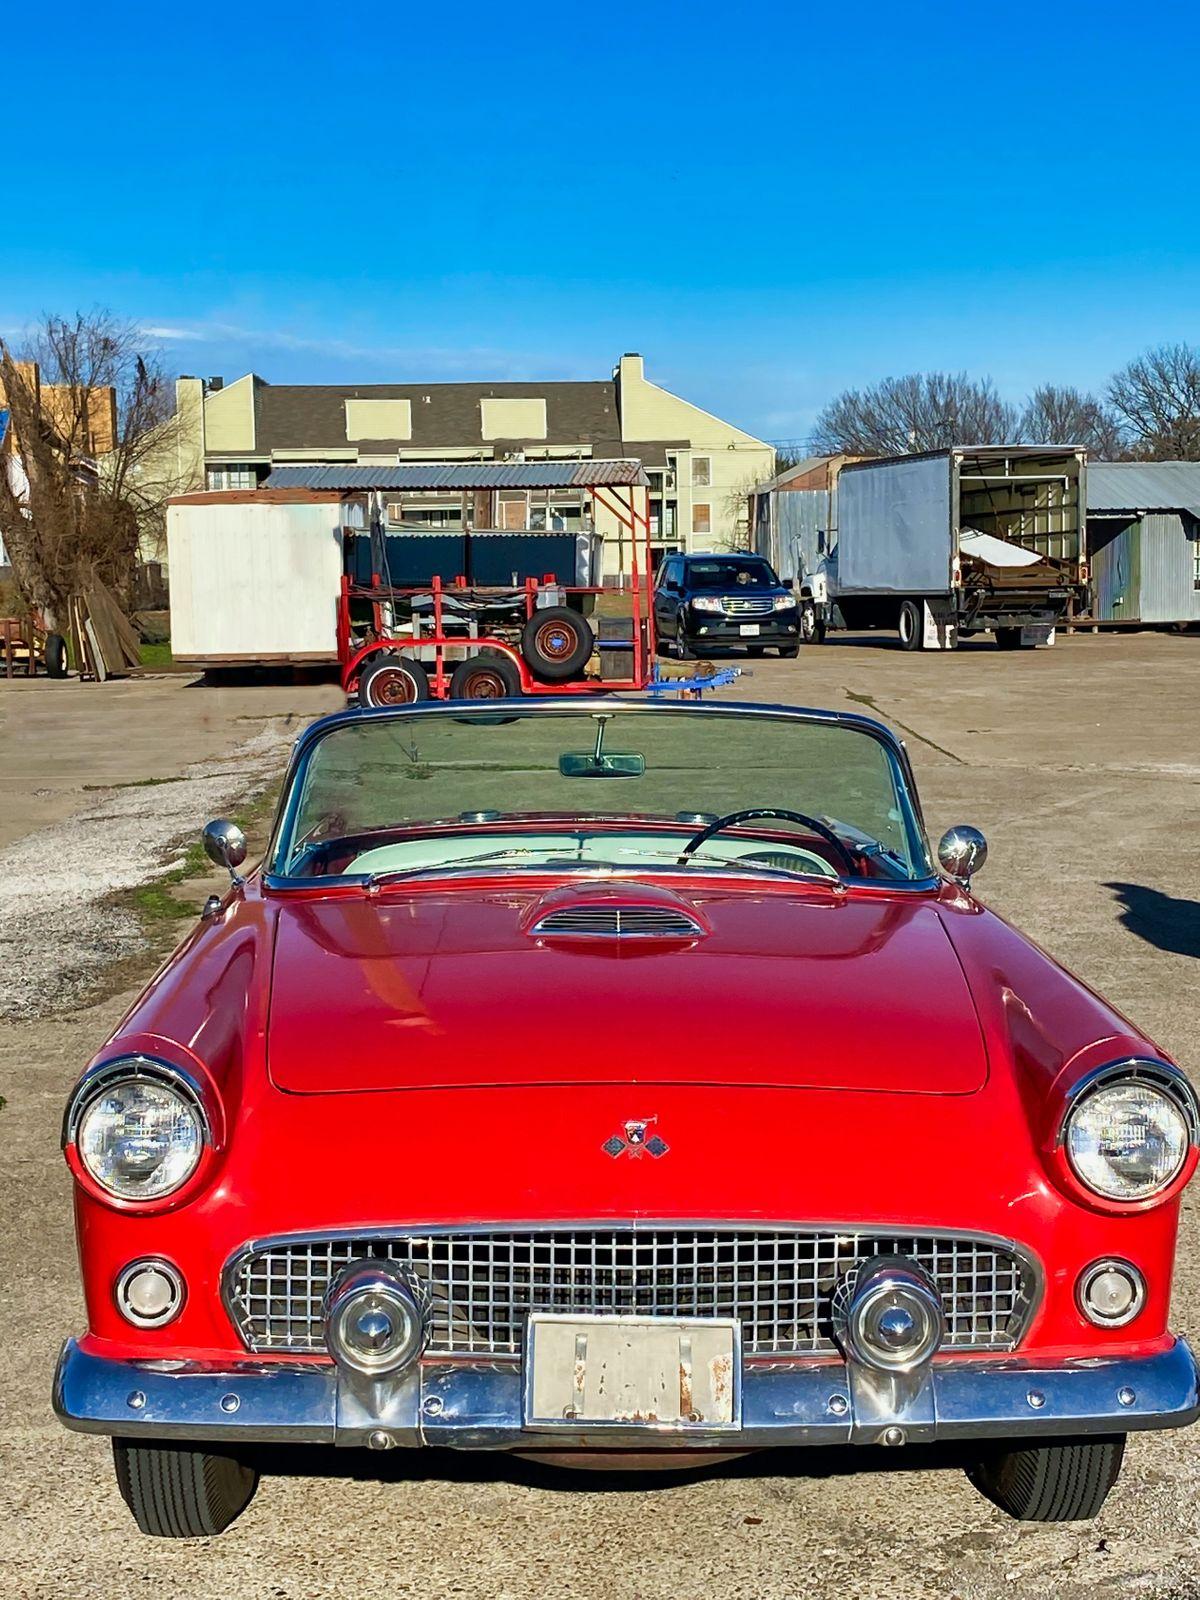 55 Ford Thunderbird Photo Video Shoot Prop Car Vehicle Rental Dallas 01.jpeg